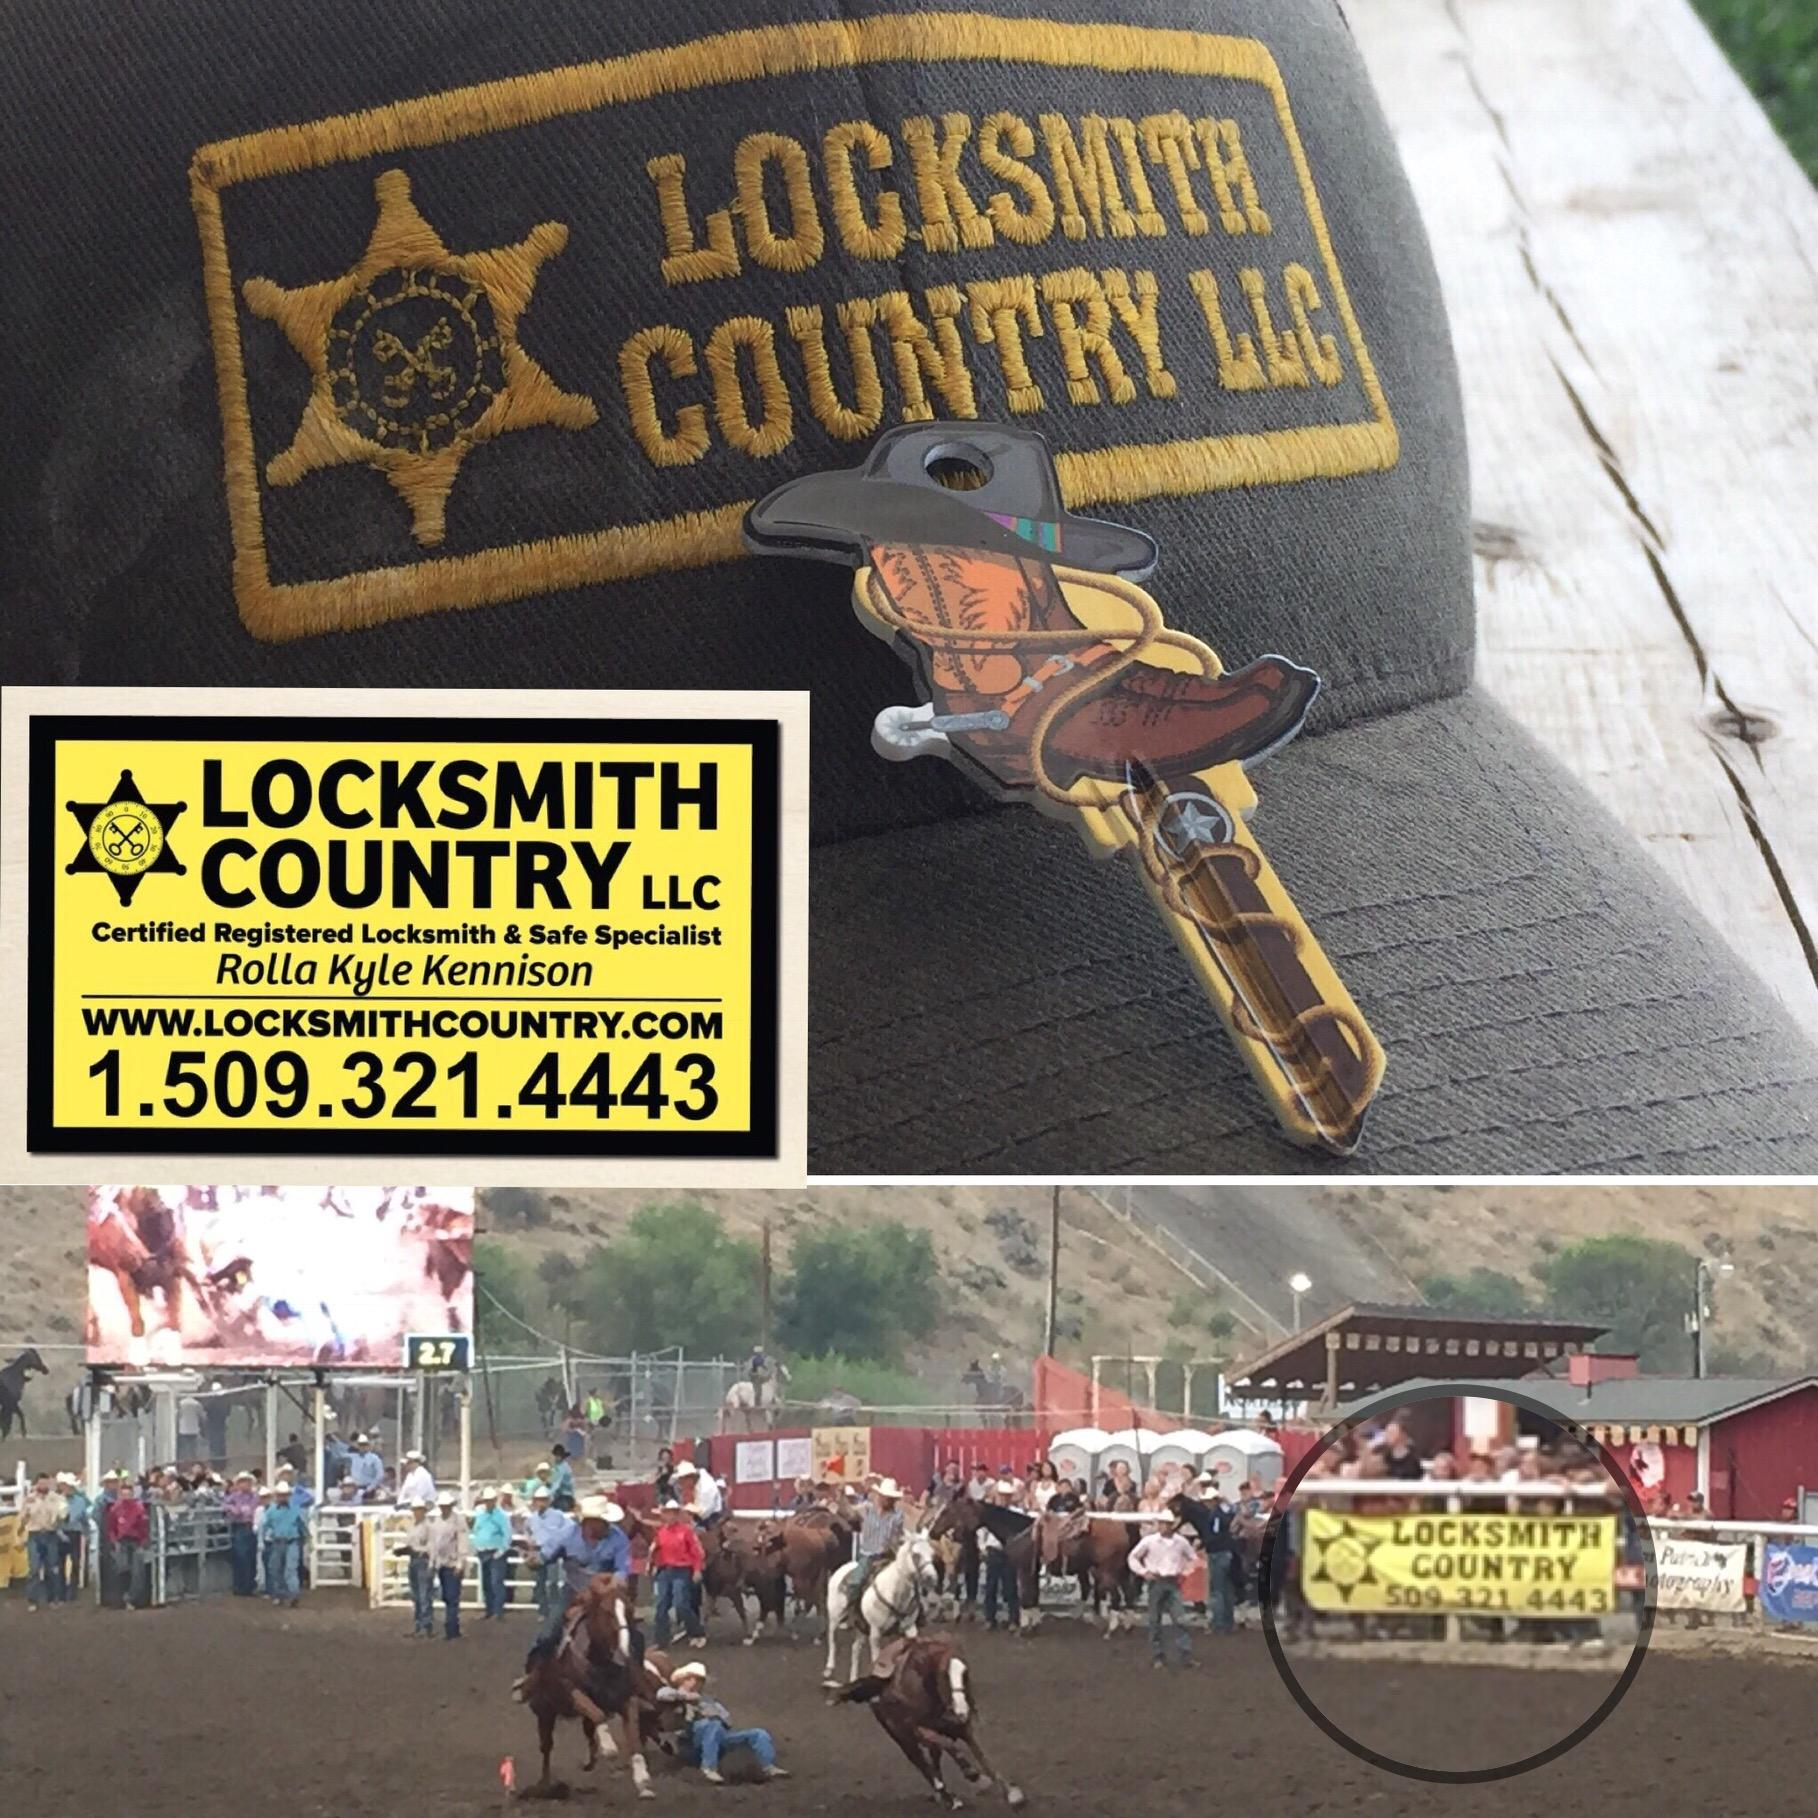 Washington's Top Rated Local® Locksmith Award Winner: Locksmith Country